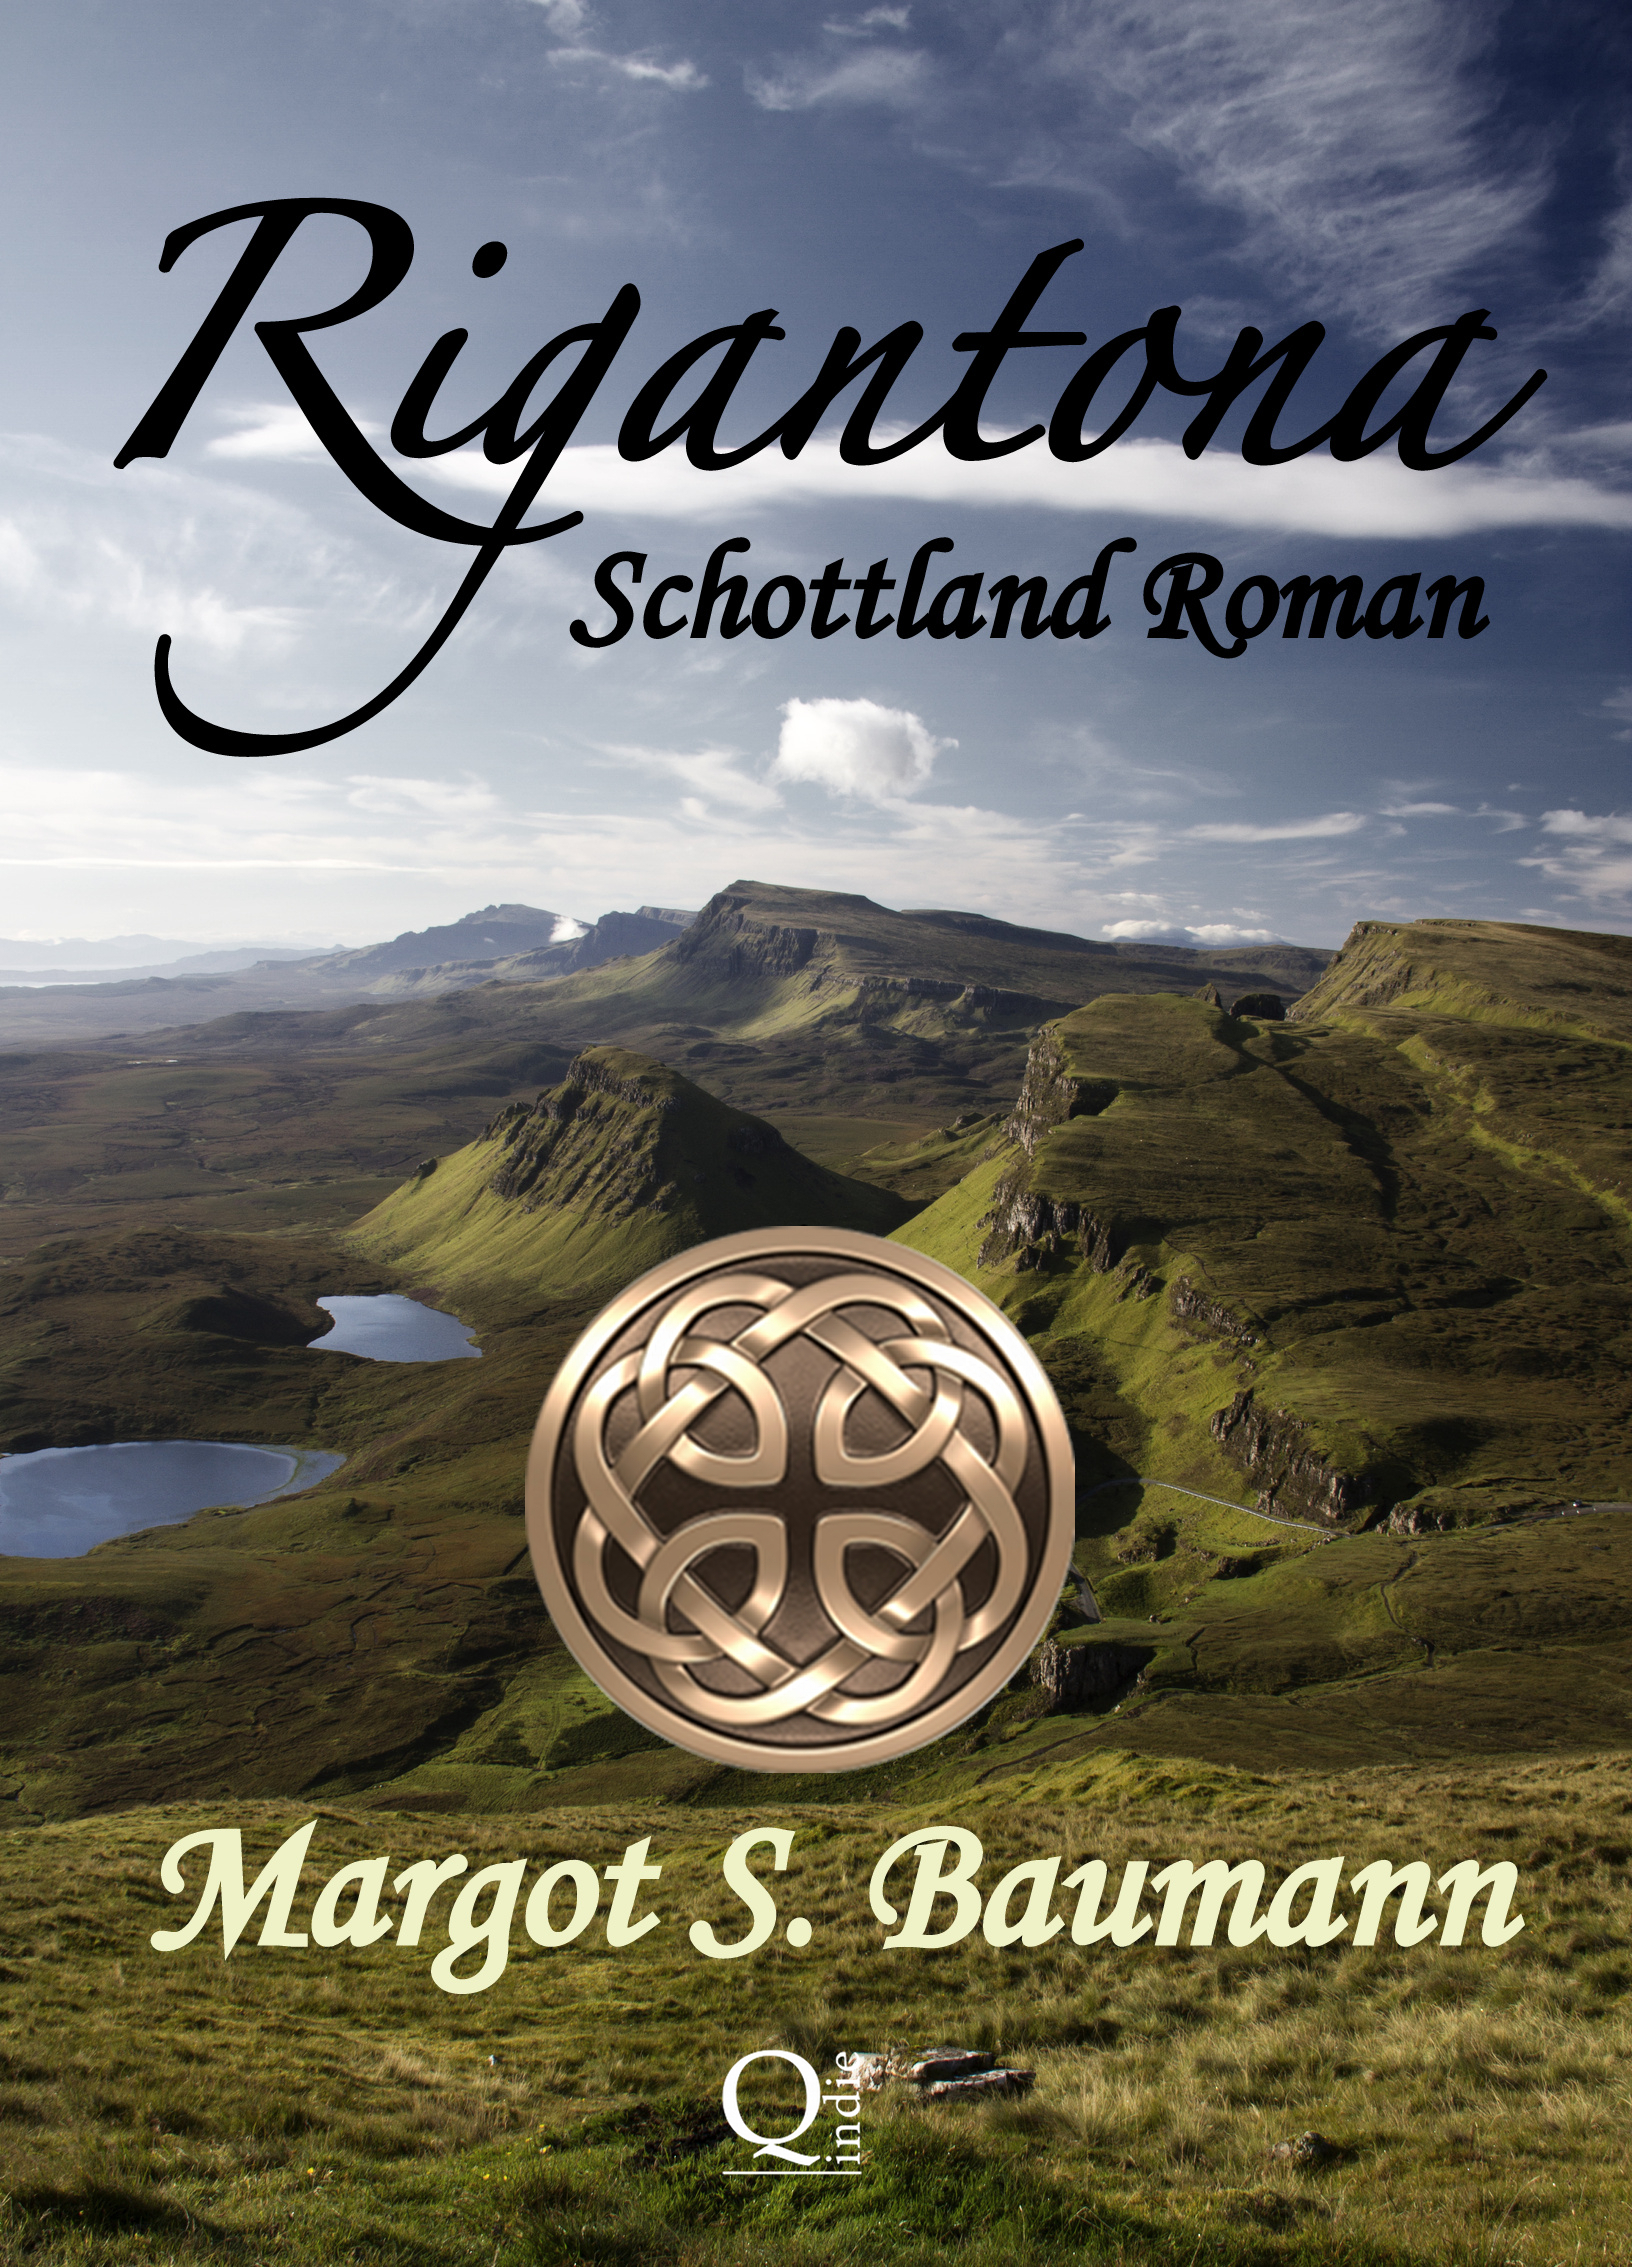 Rigantona Margot S. Baumann